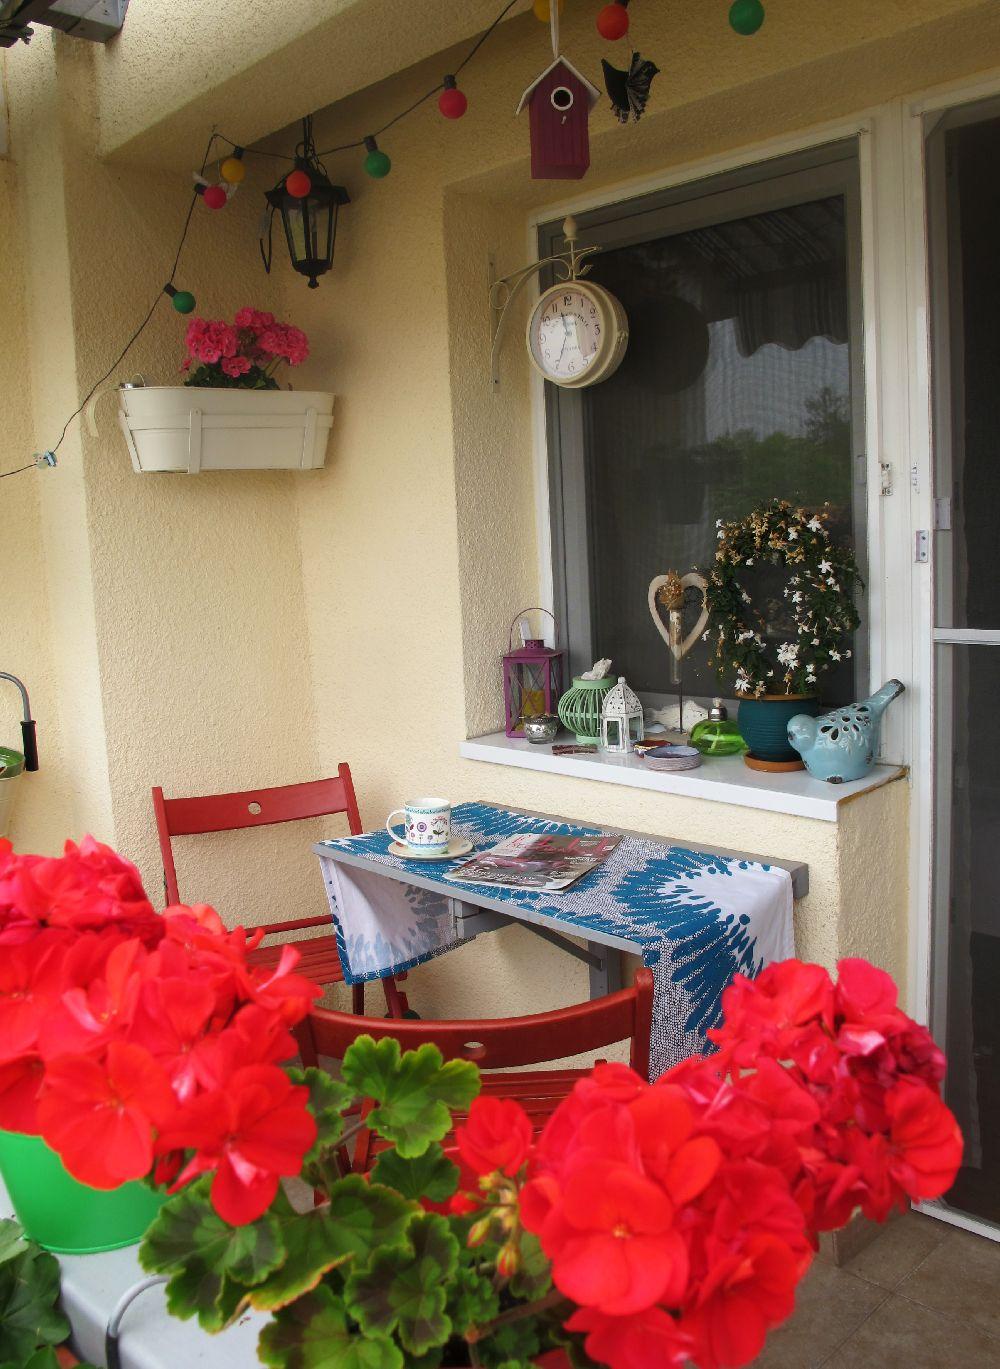 adelaparvu.com despre apartament 3 camere colorat in Sibiu, Foto Adela Parvu (95)